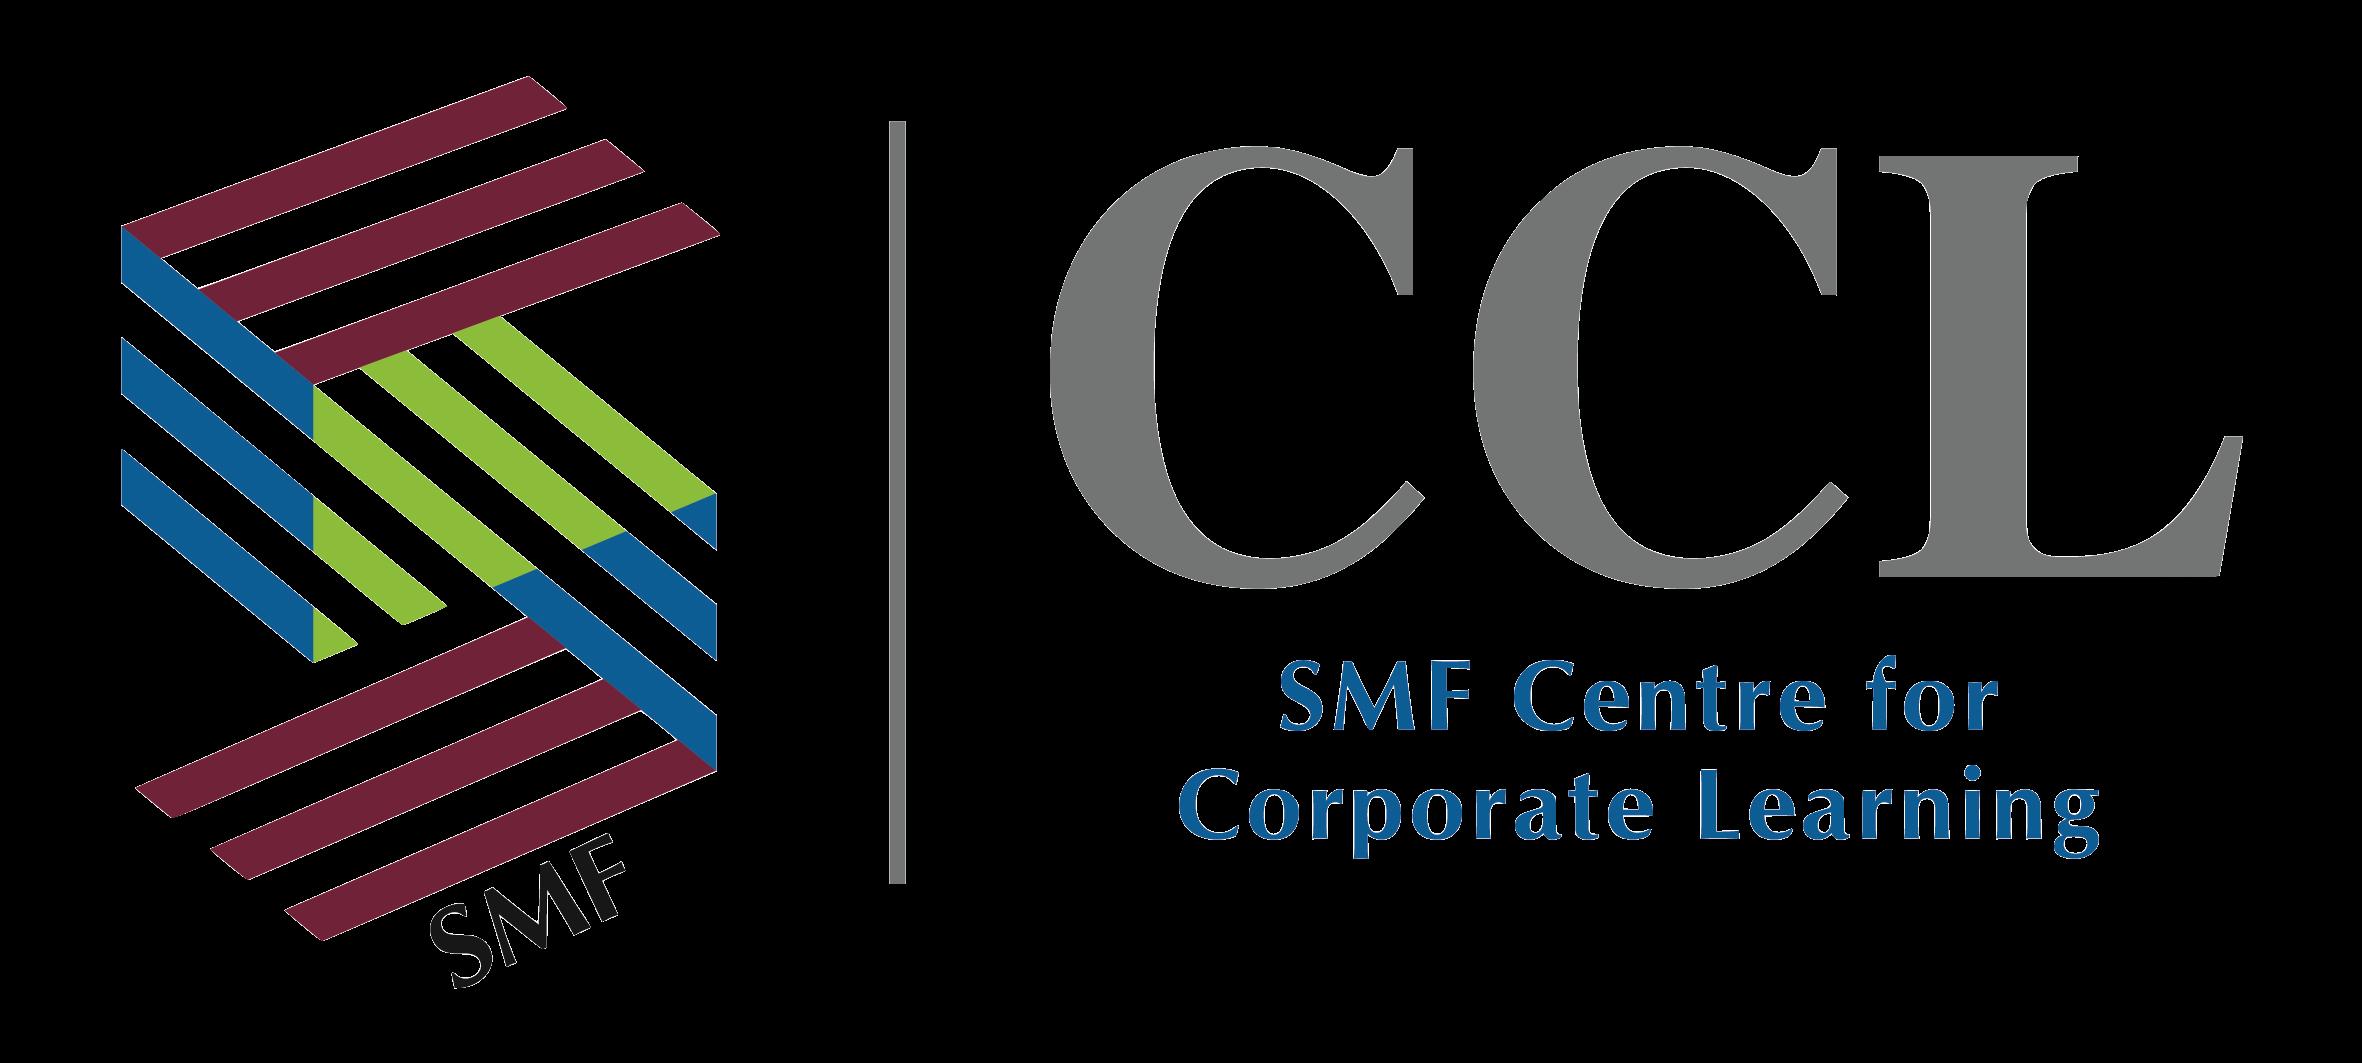 smf-ccl-stendard-event